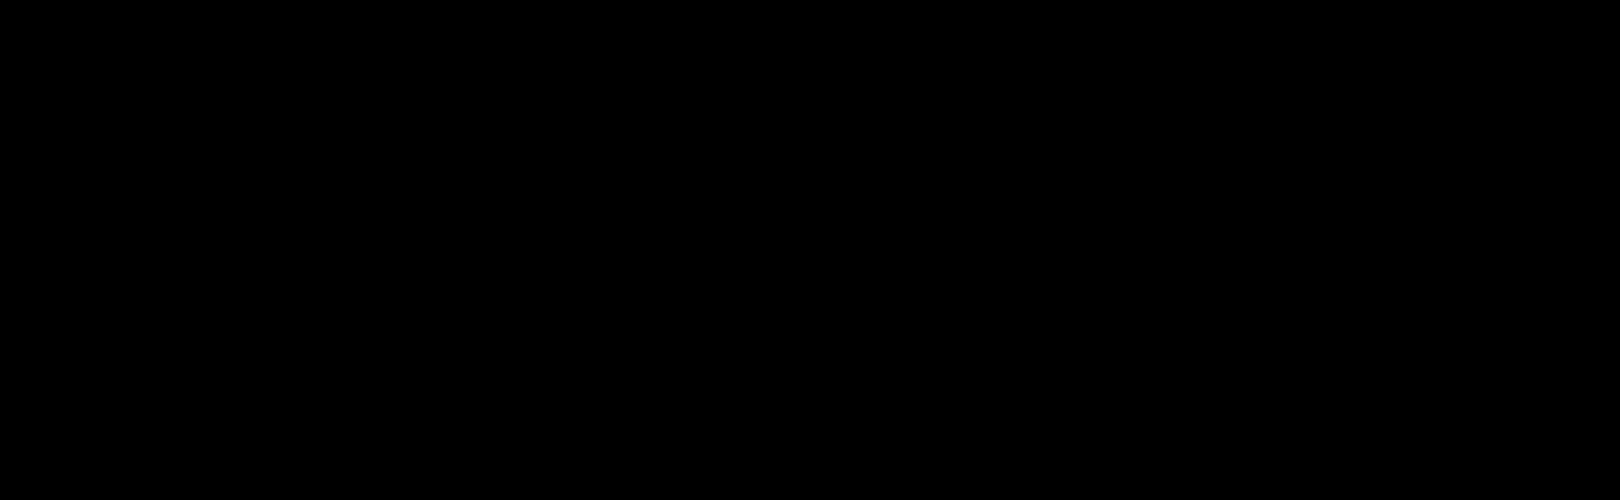 Copy of Copy of lmv (3)